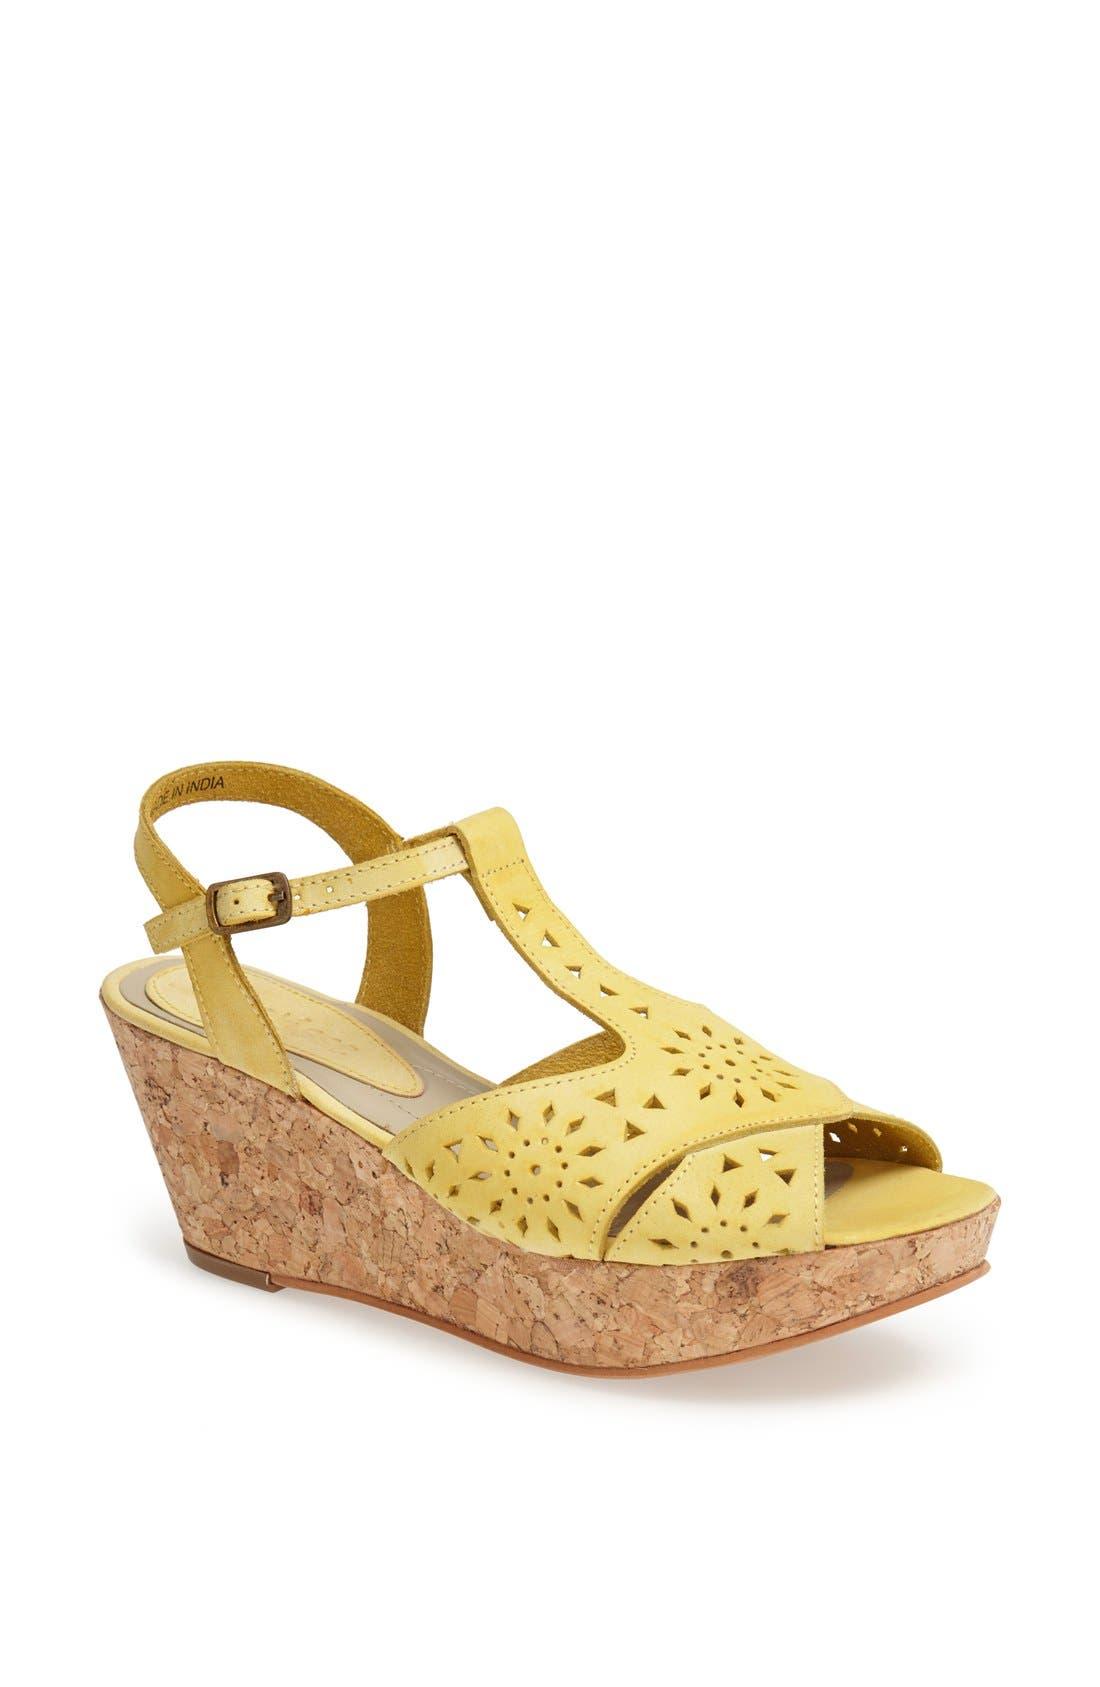 Alternate Image 1 Selected - Matisse 'Sweet' Leather T-Strap Wedge Sandal